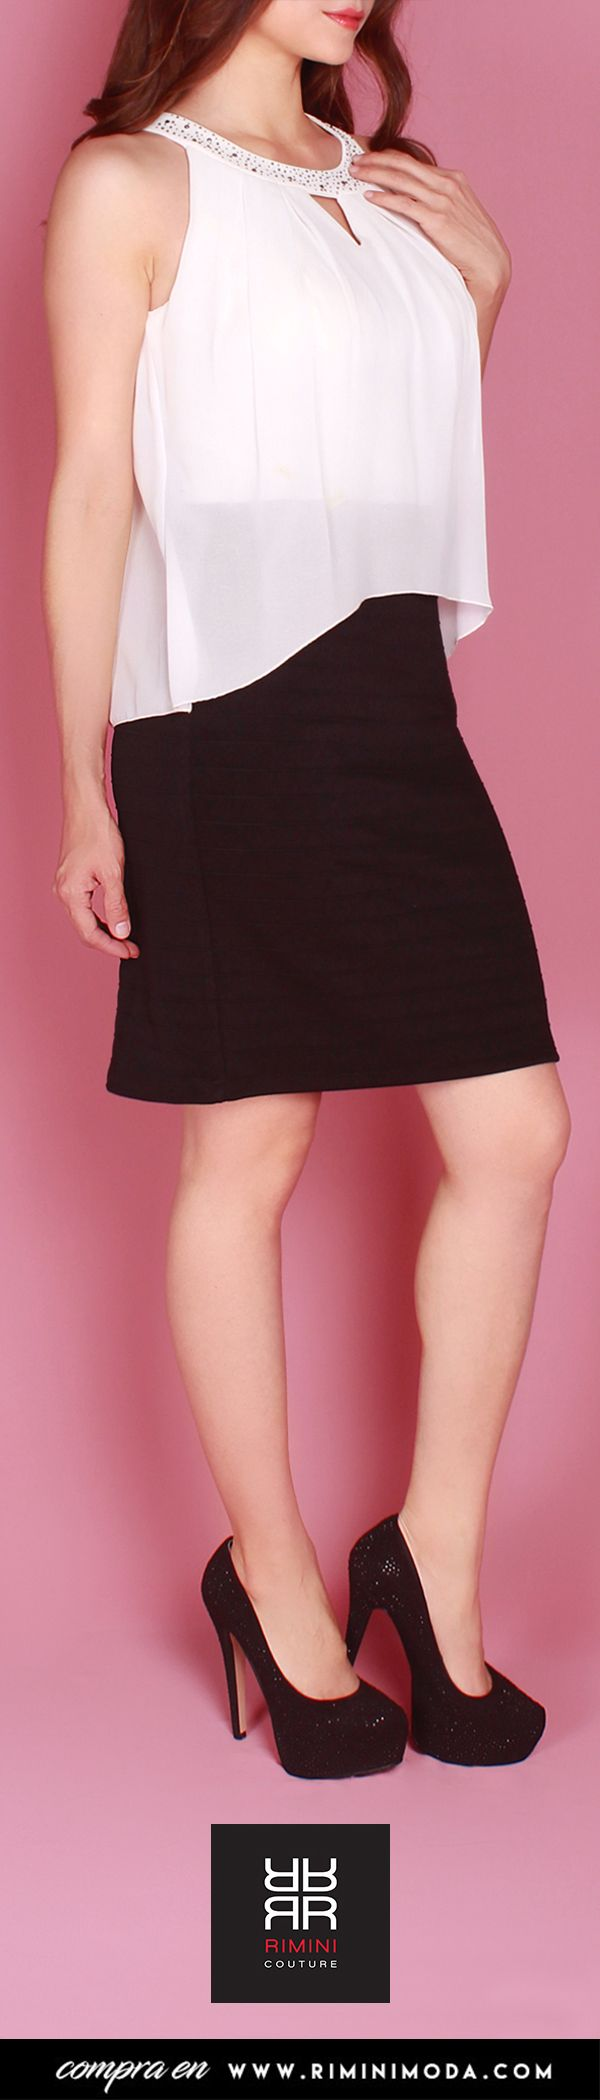 Vestido de Fiesta Corto Blanco y Negro. RIMINI Couture   Pinterest ...